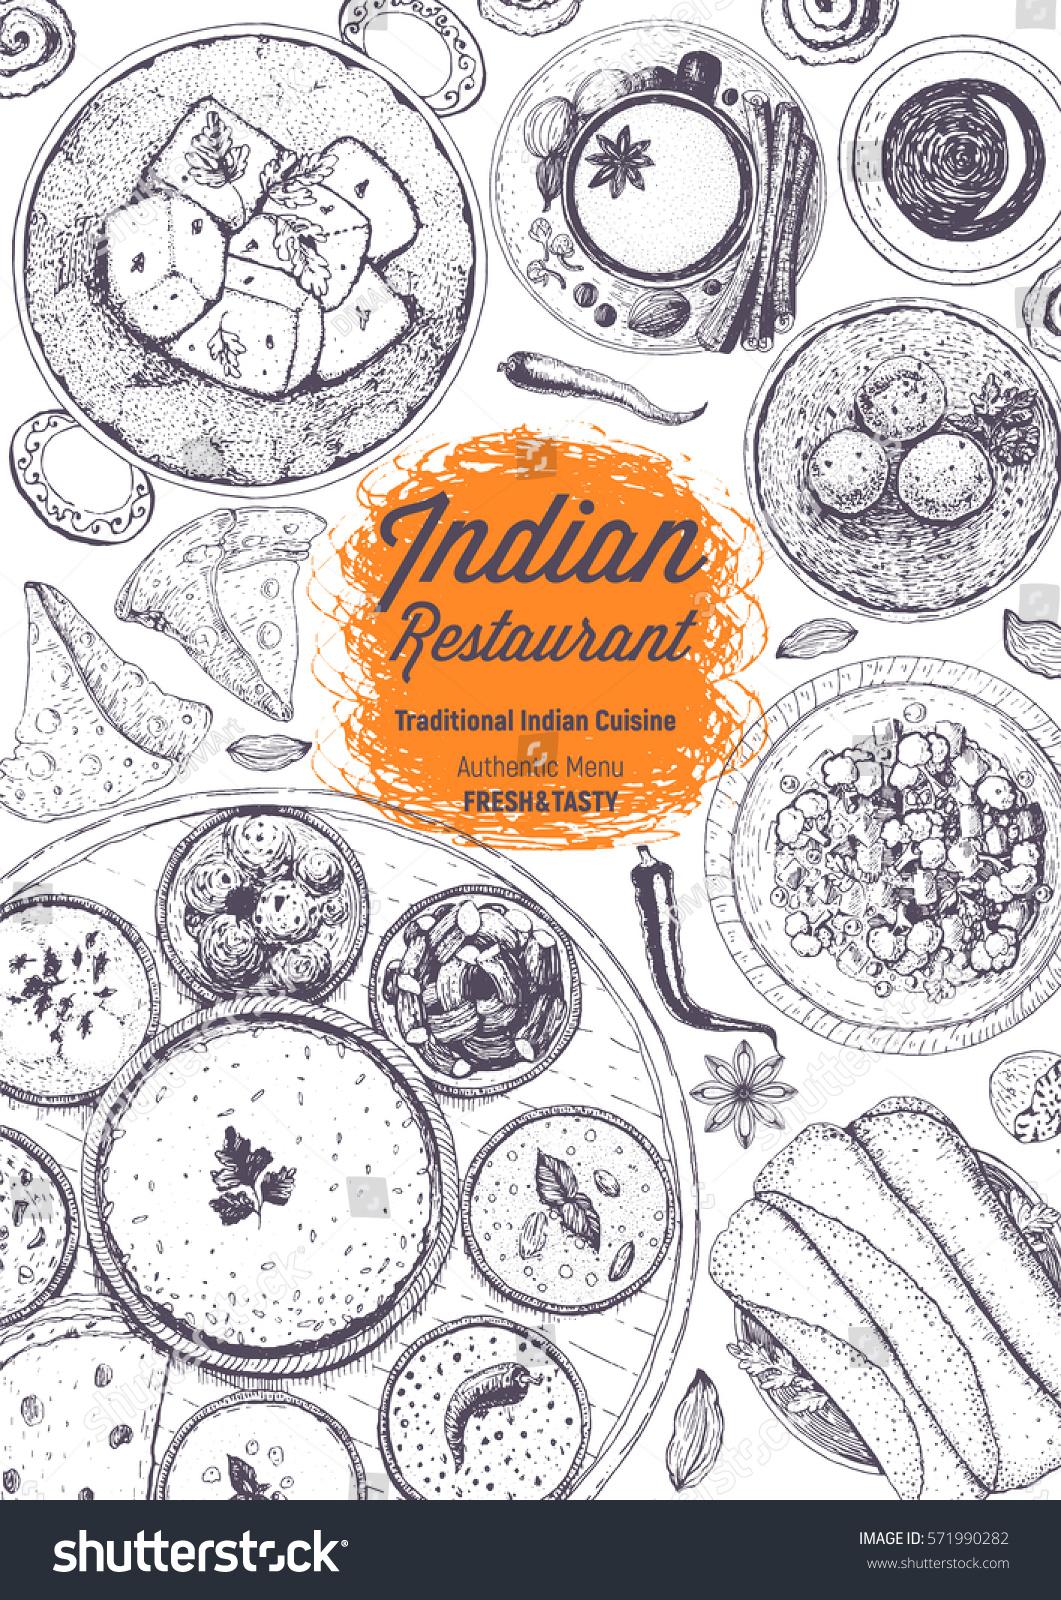 Indian Cuisine Top View Frame Indian Stock Vector 571990282 - Shutterstock